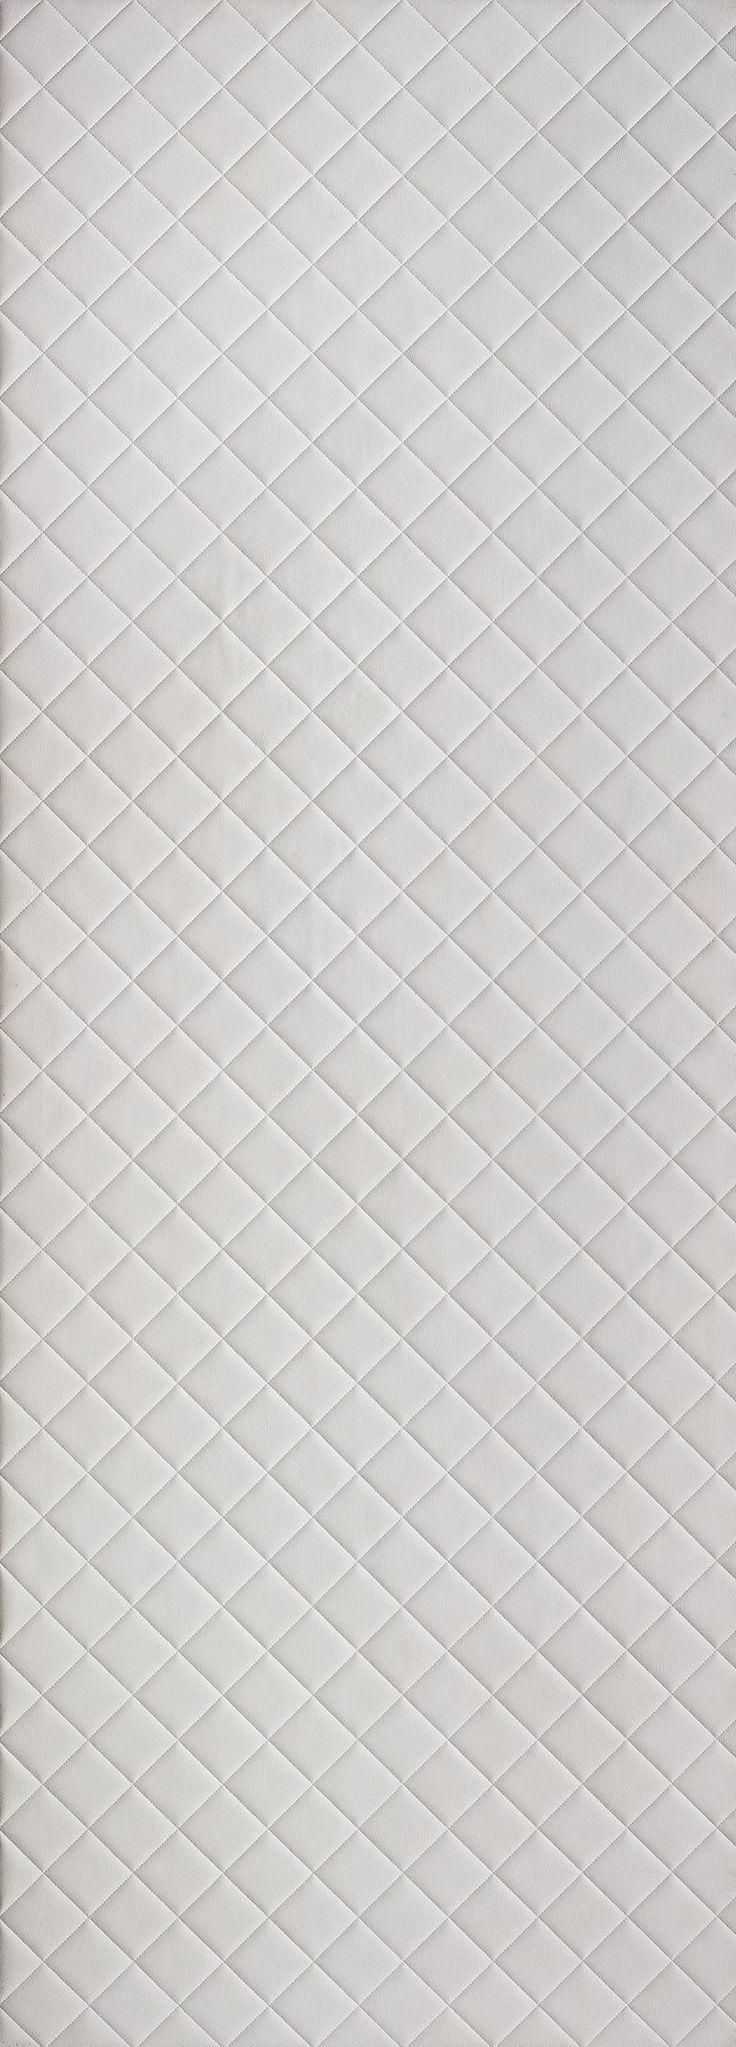 Panneaux muraux murs design en b ton banch concrete lcda p s p s pinterest design - Beton lcda ...